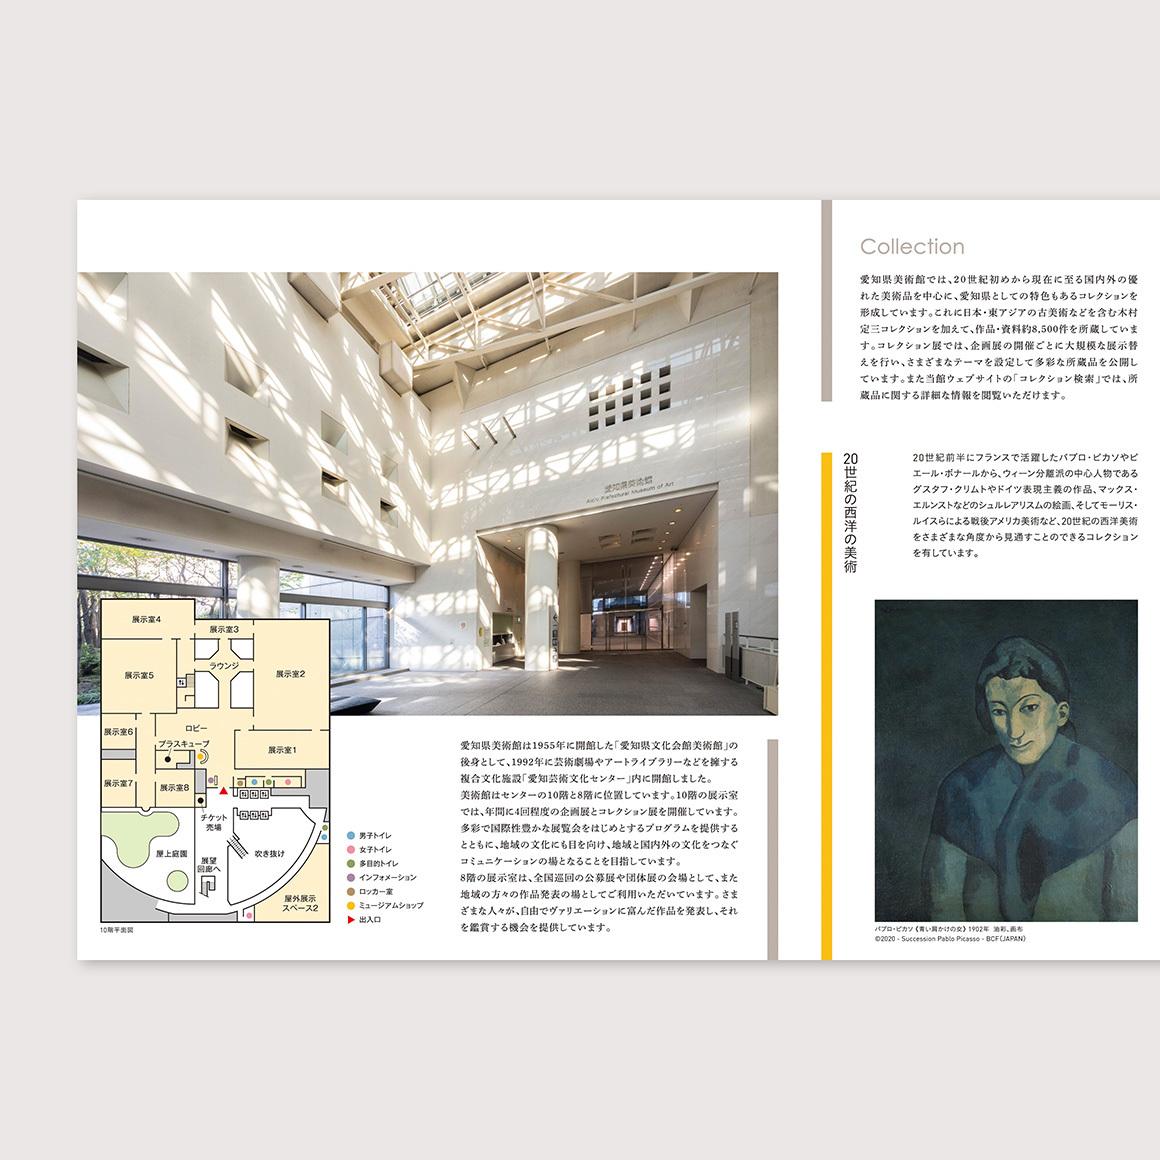 WORKS|愛知県美術館ガイド_e0206124_11305346.jpg